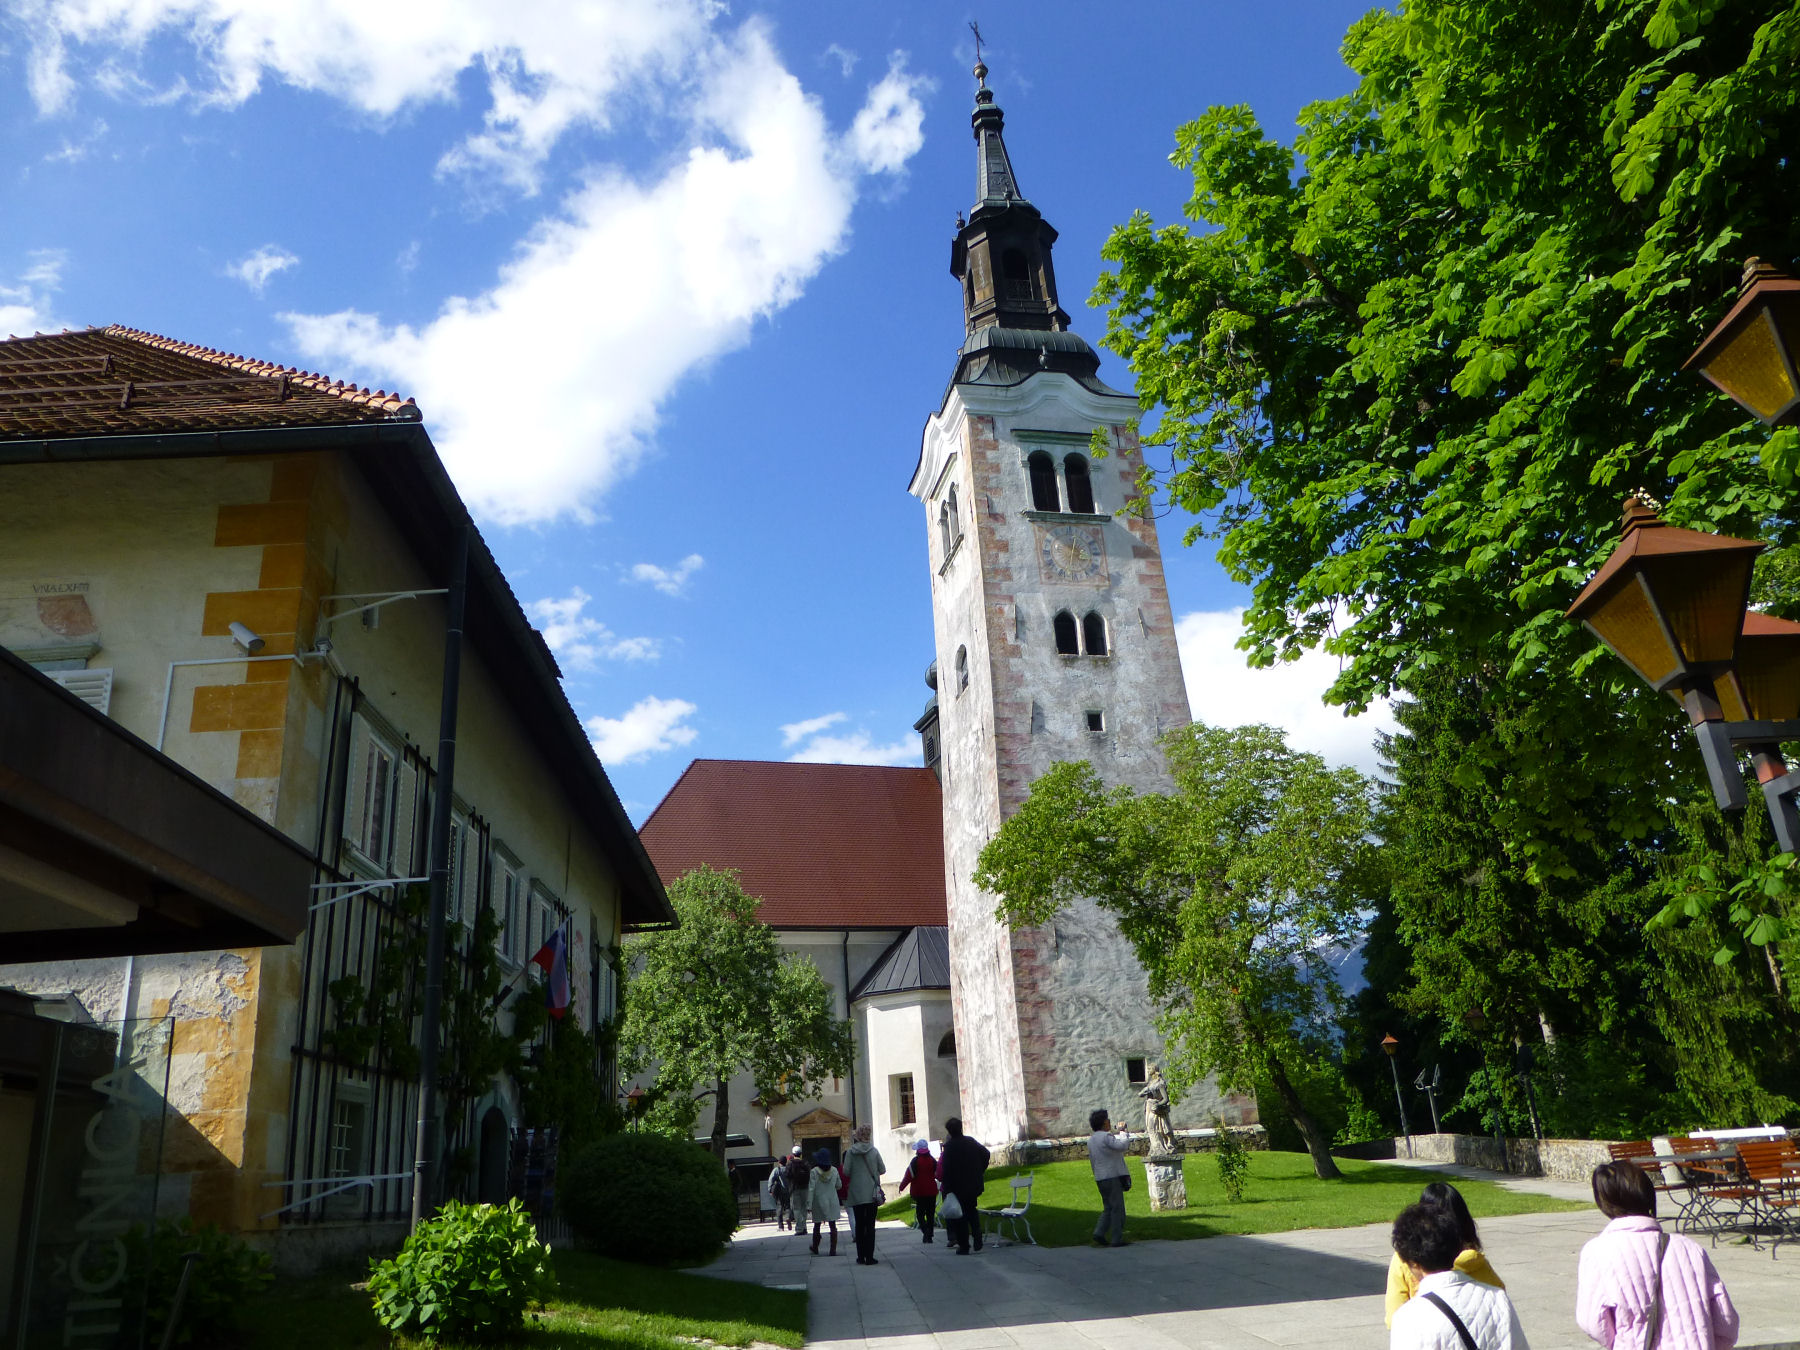 island-church-exterior-tourists